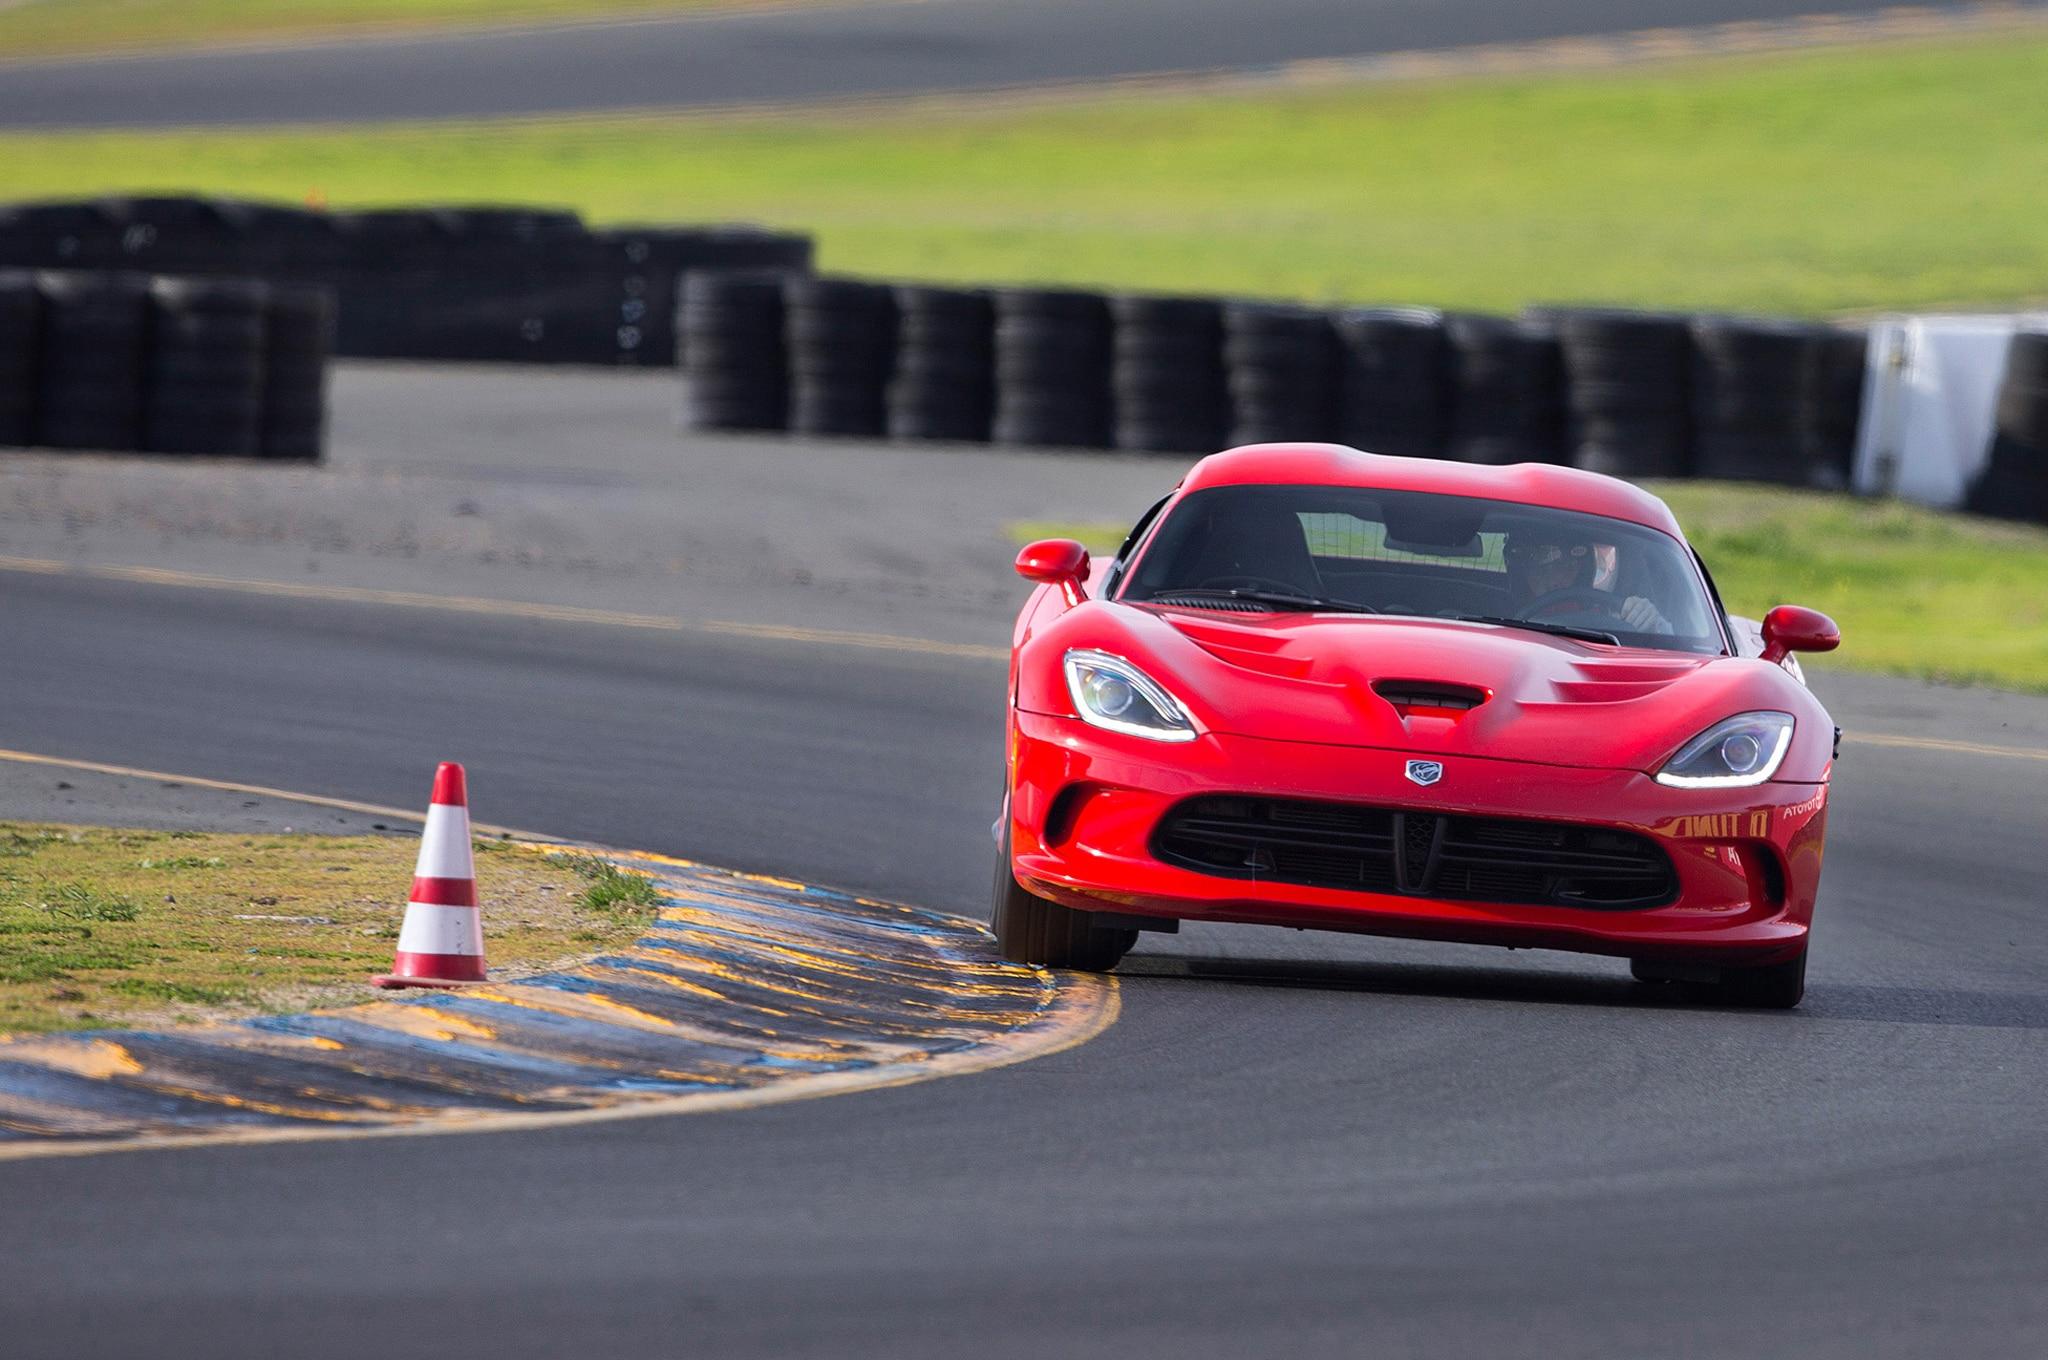 2013 SRT Viper On Track Front1